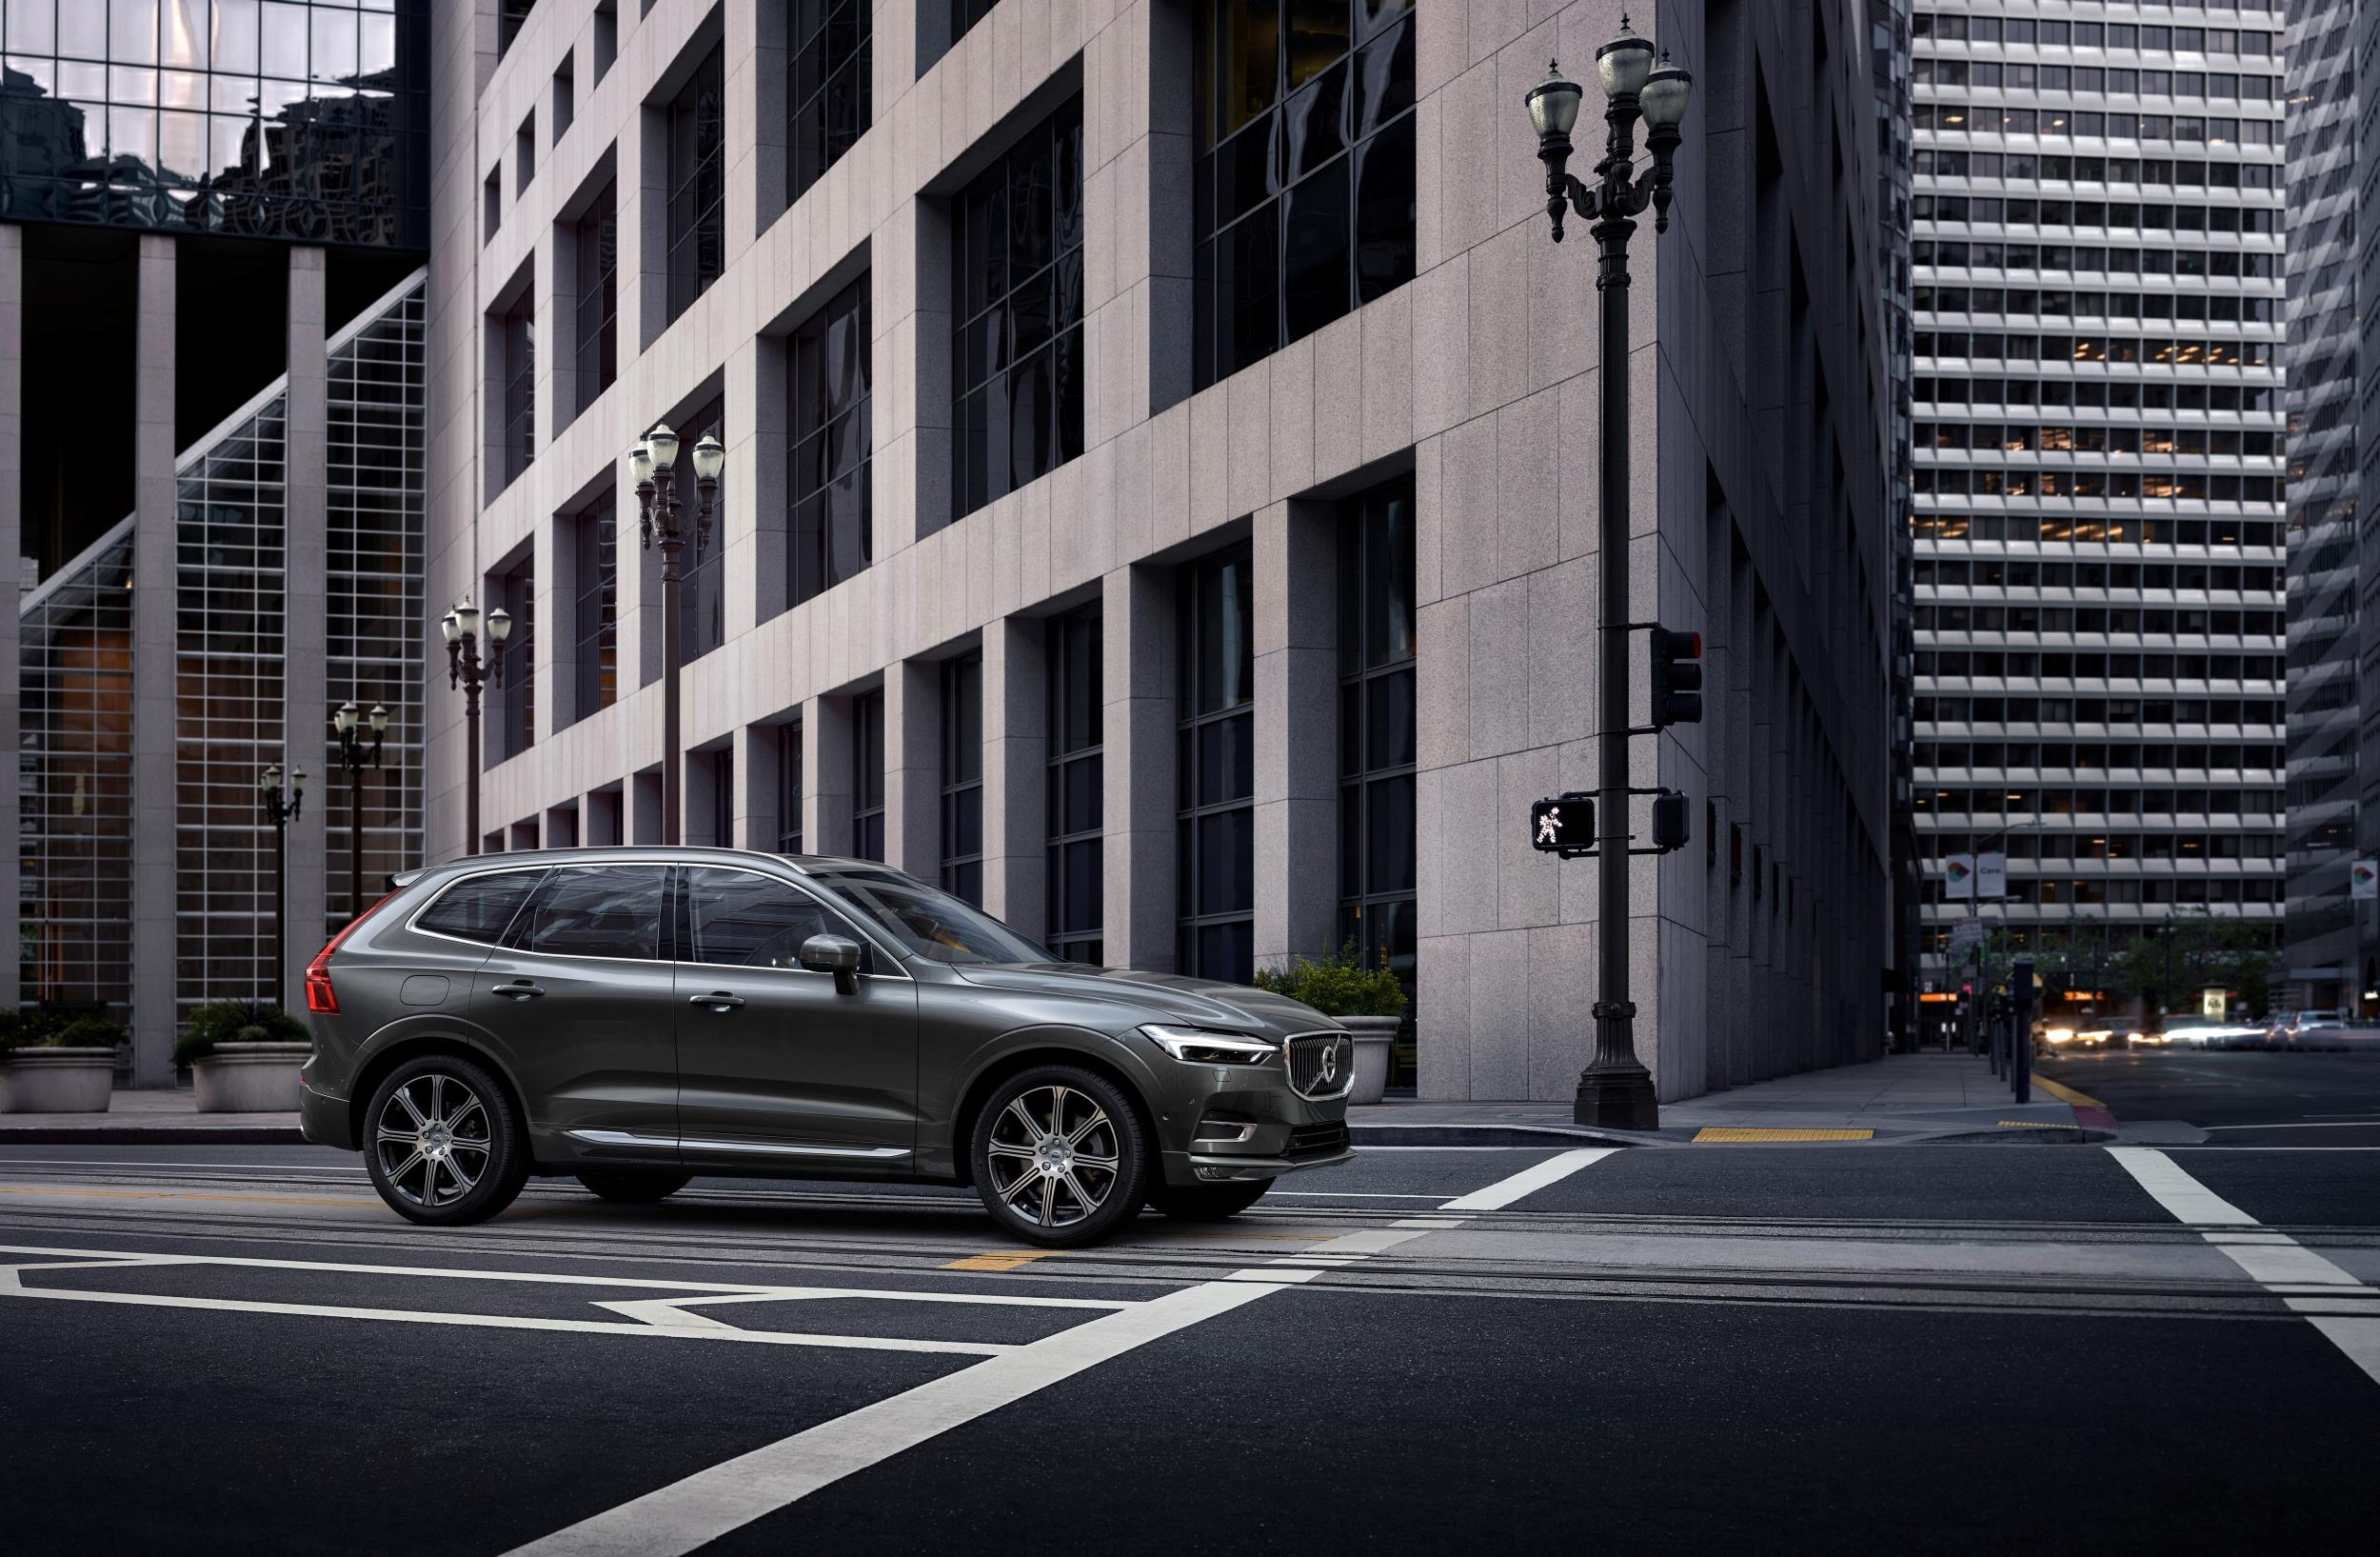 208065_The new Volvo XC60.jpg